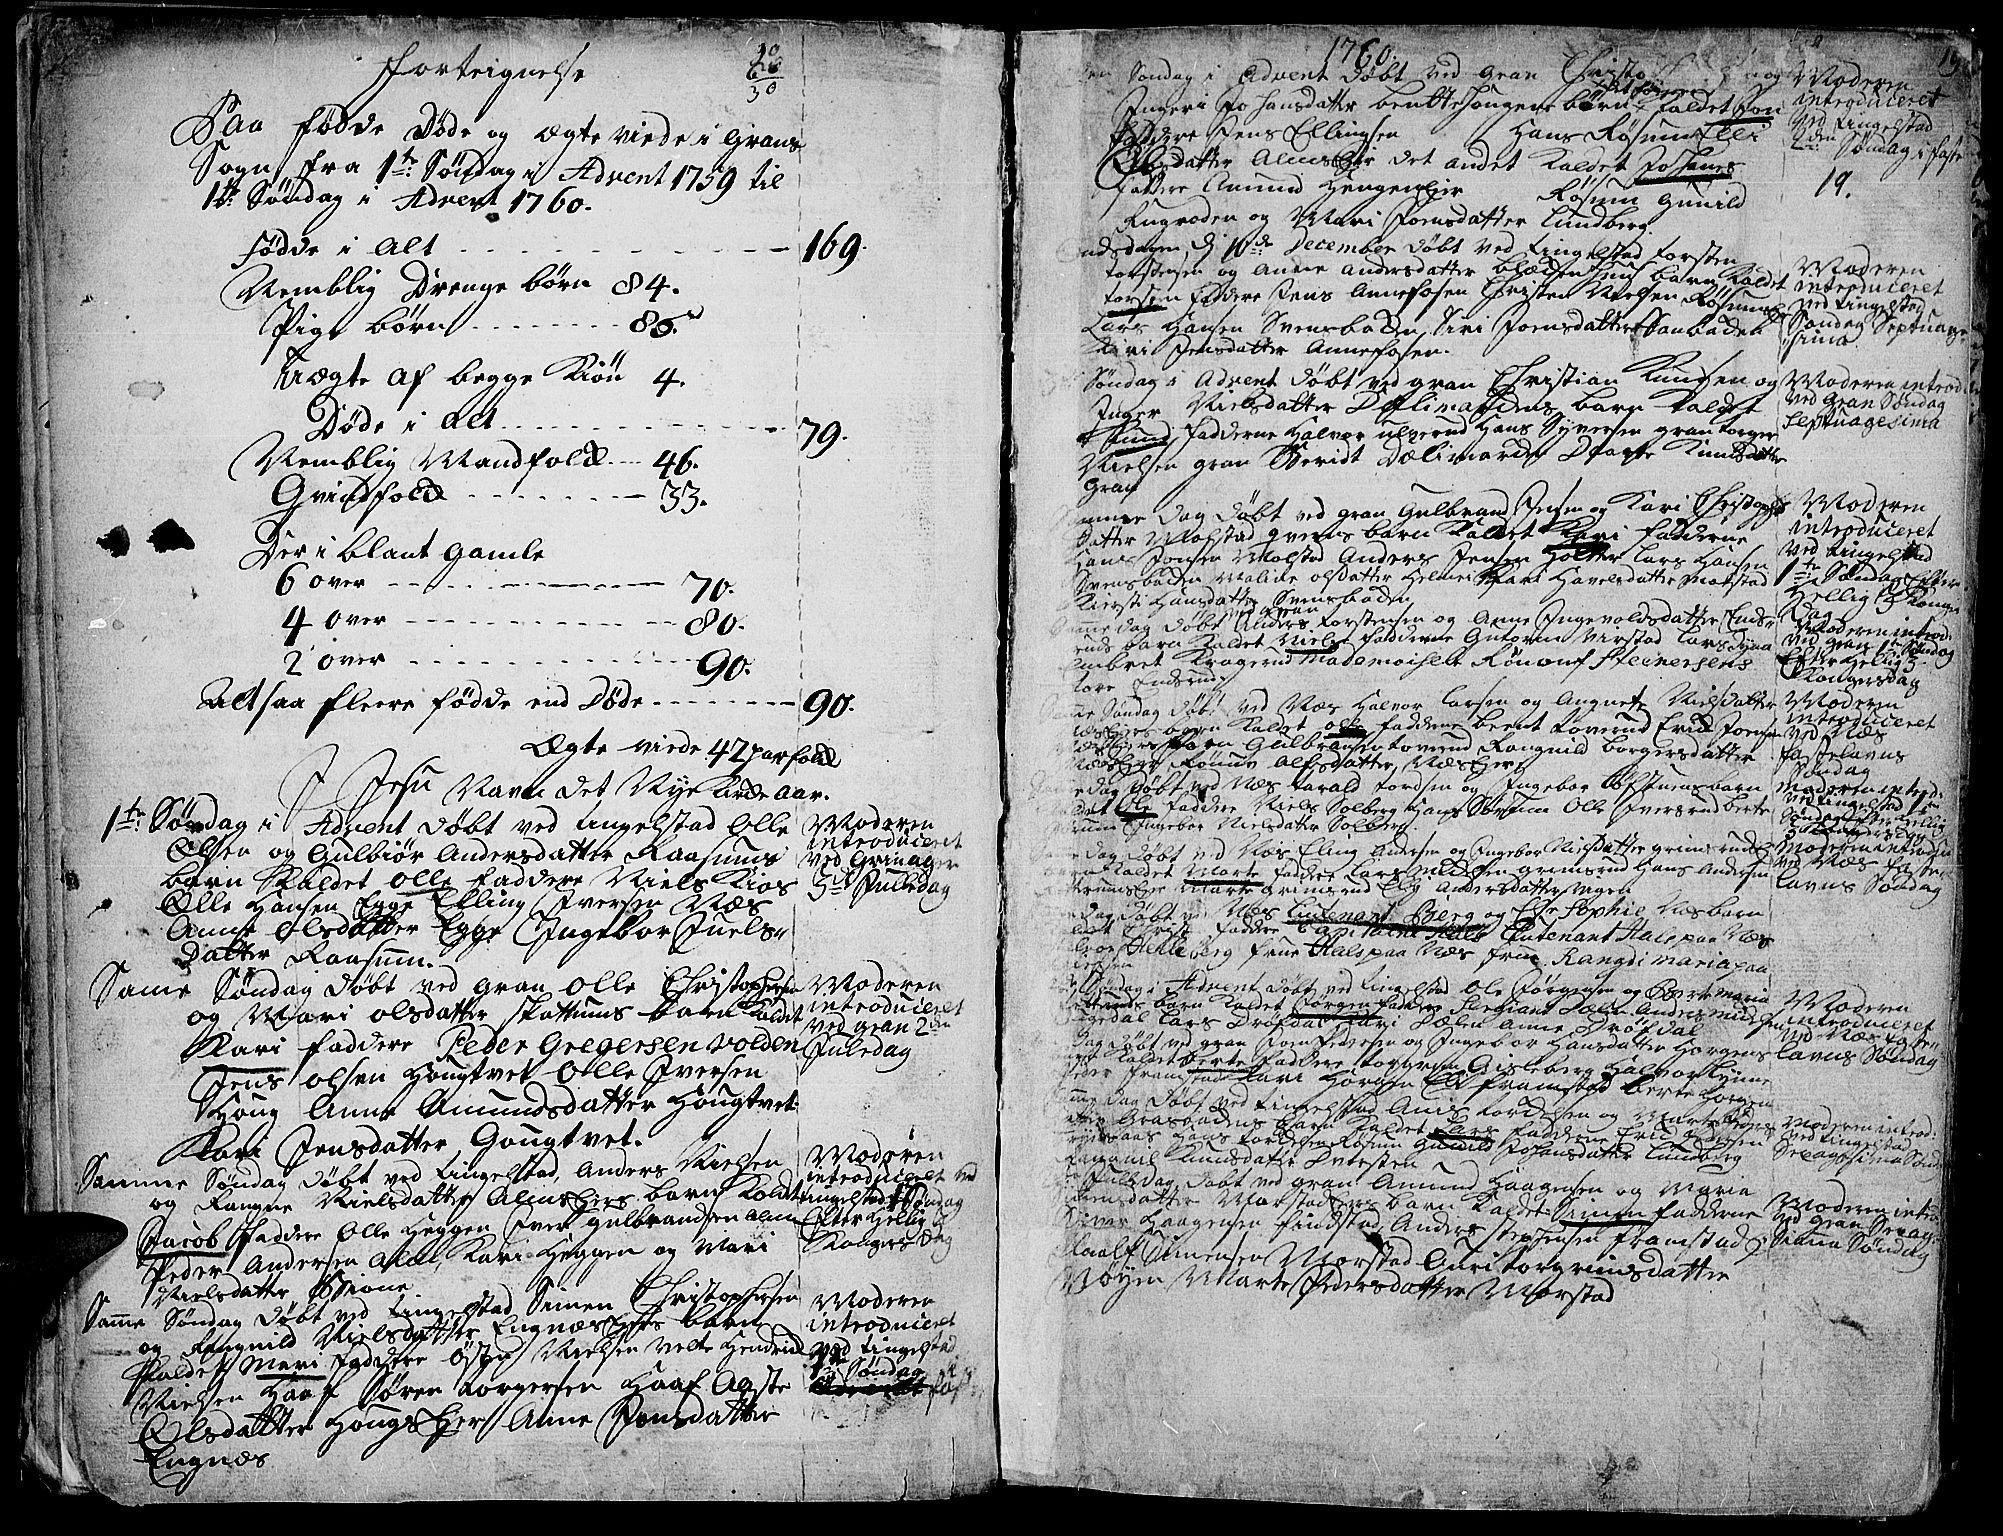 SAH, Gran prestekontor, Ministerialbok nr. 4, 1759-1775, s. 19